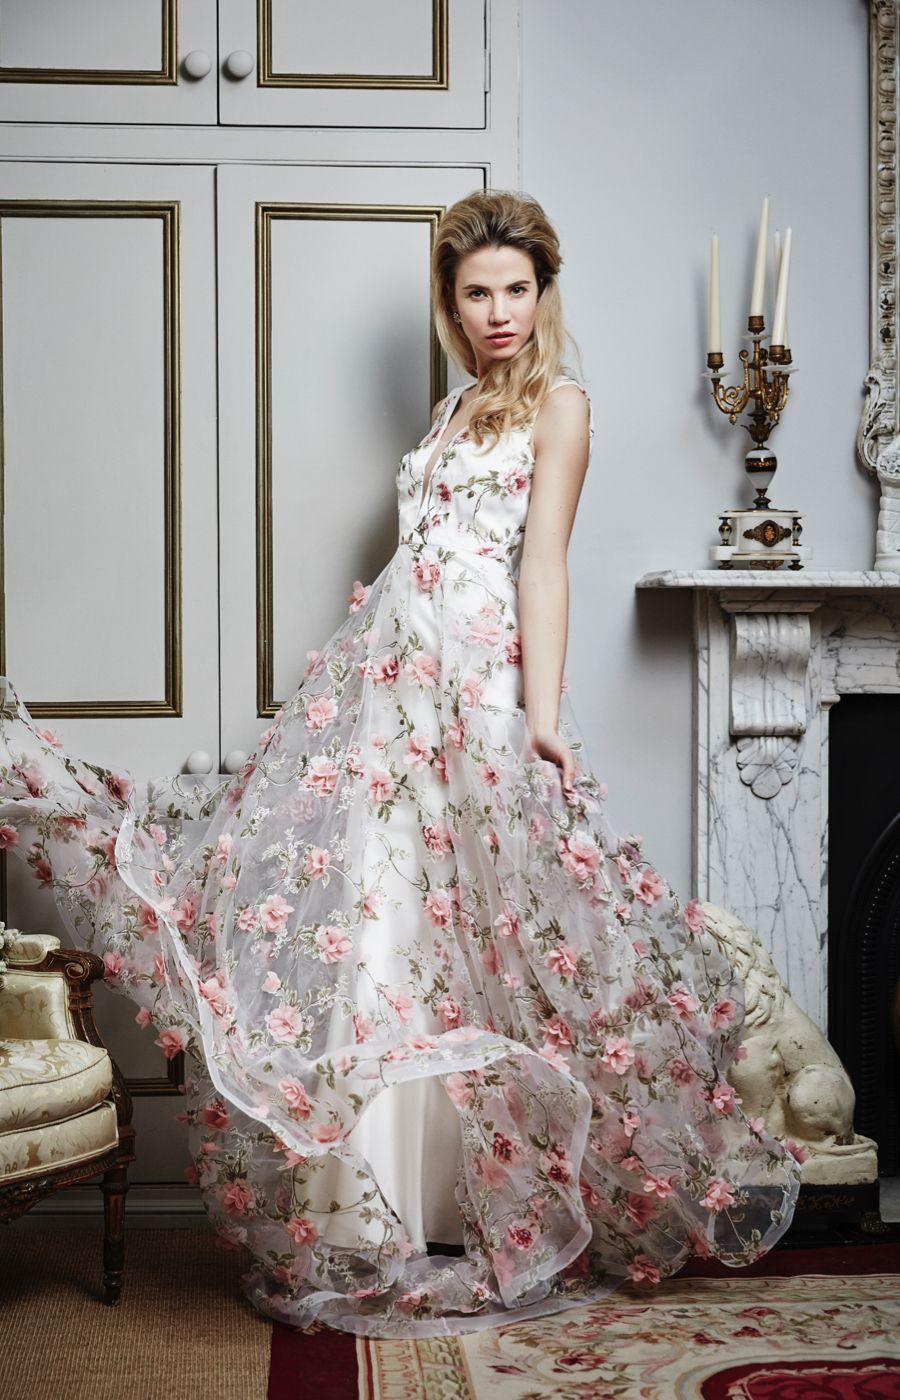 Flora, Savin London. floral dress from Savin